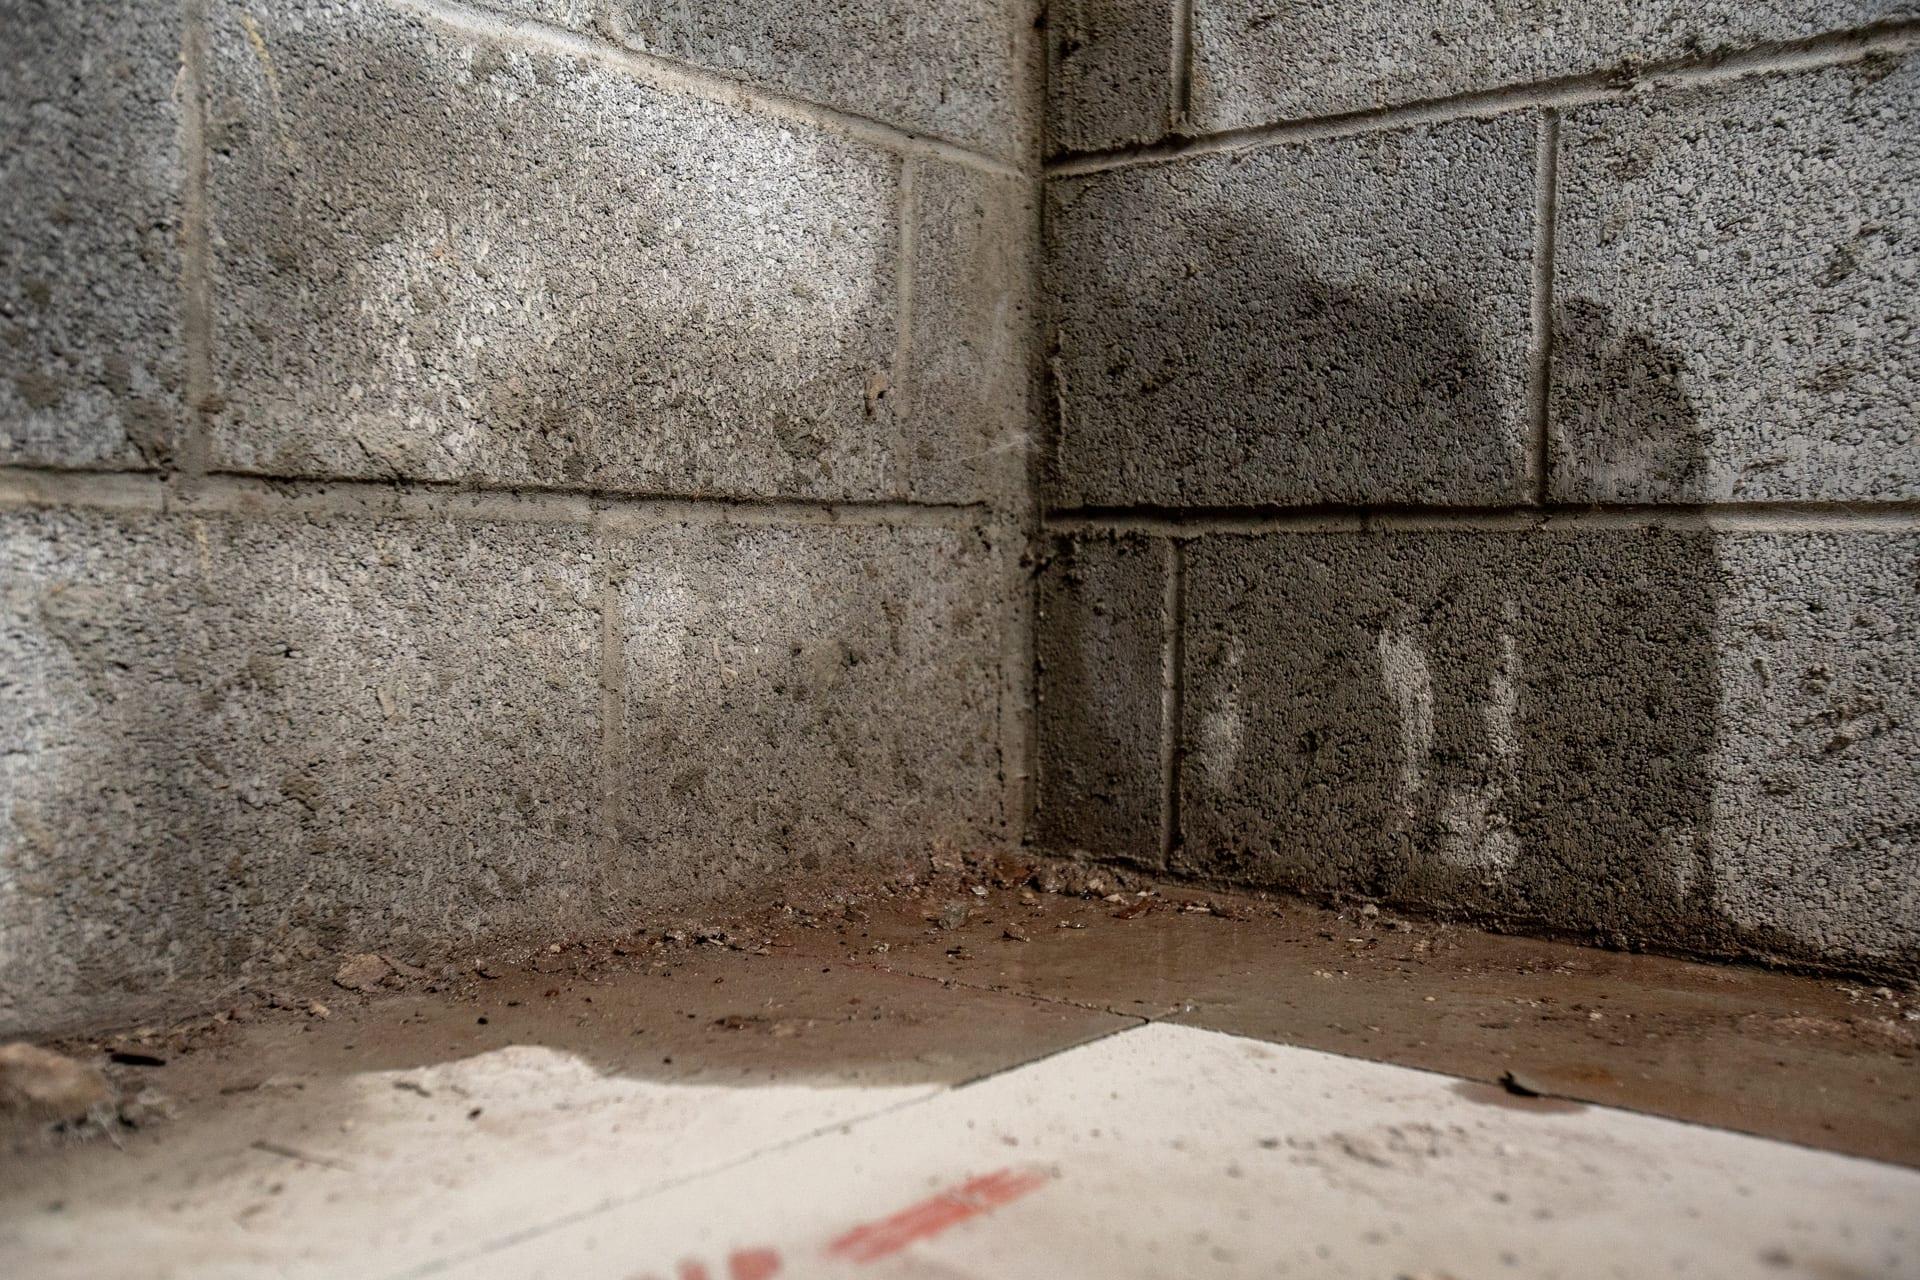 Basement Waterproofing | Maintenance & Repair | Nova Construction Pro